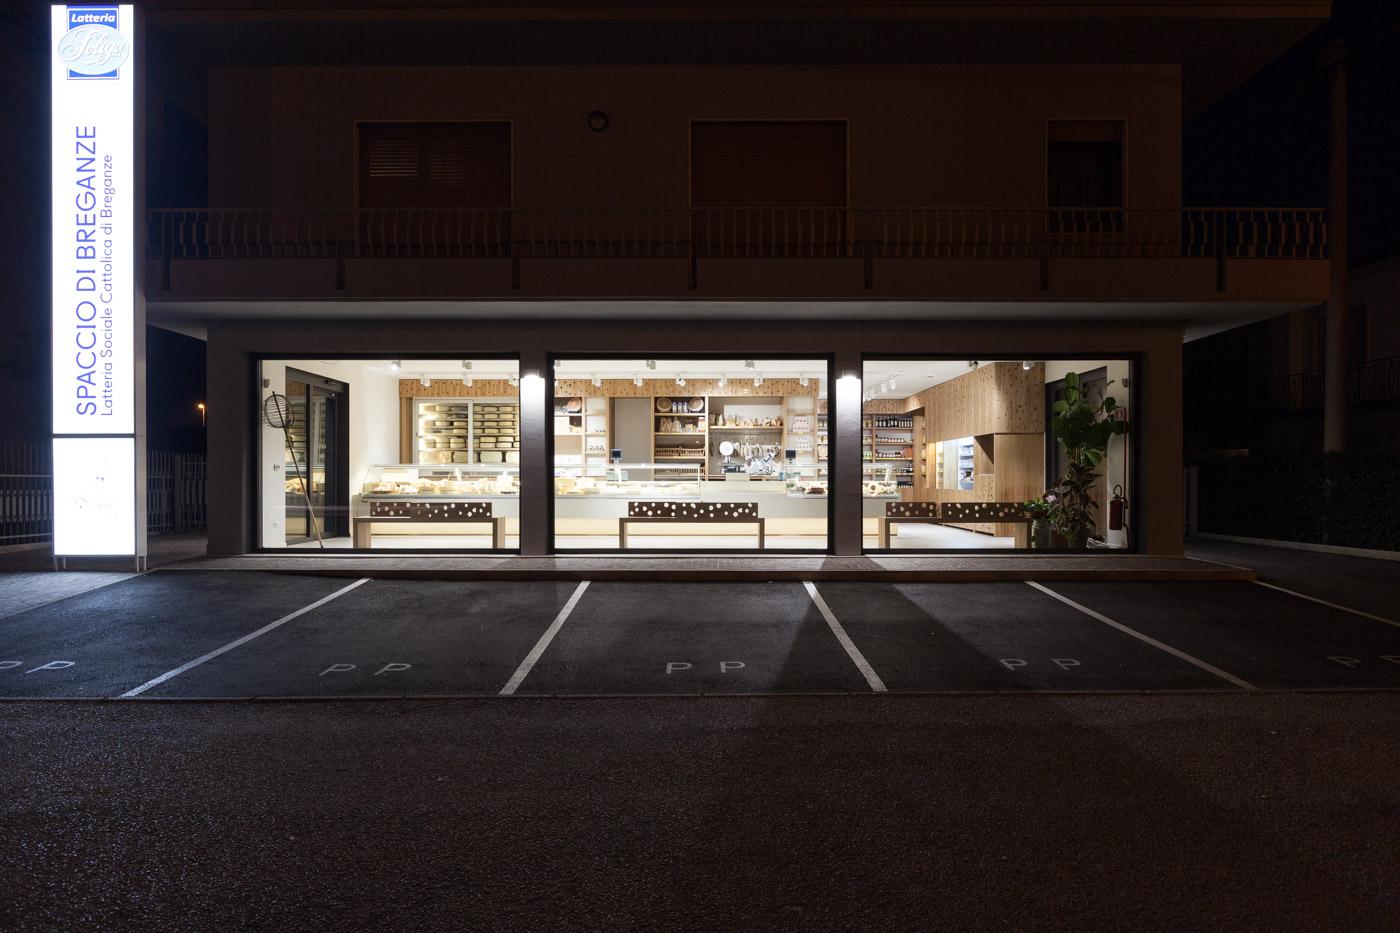 Gourmet Store Latteria di Soligo_0